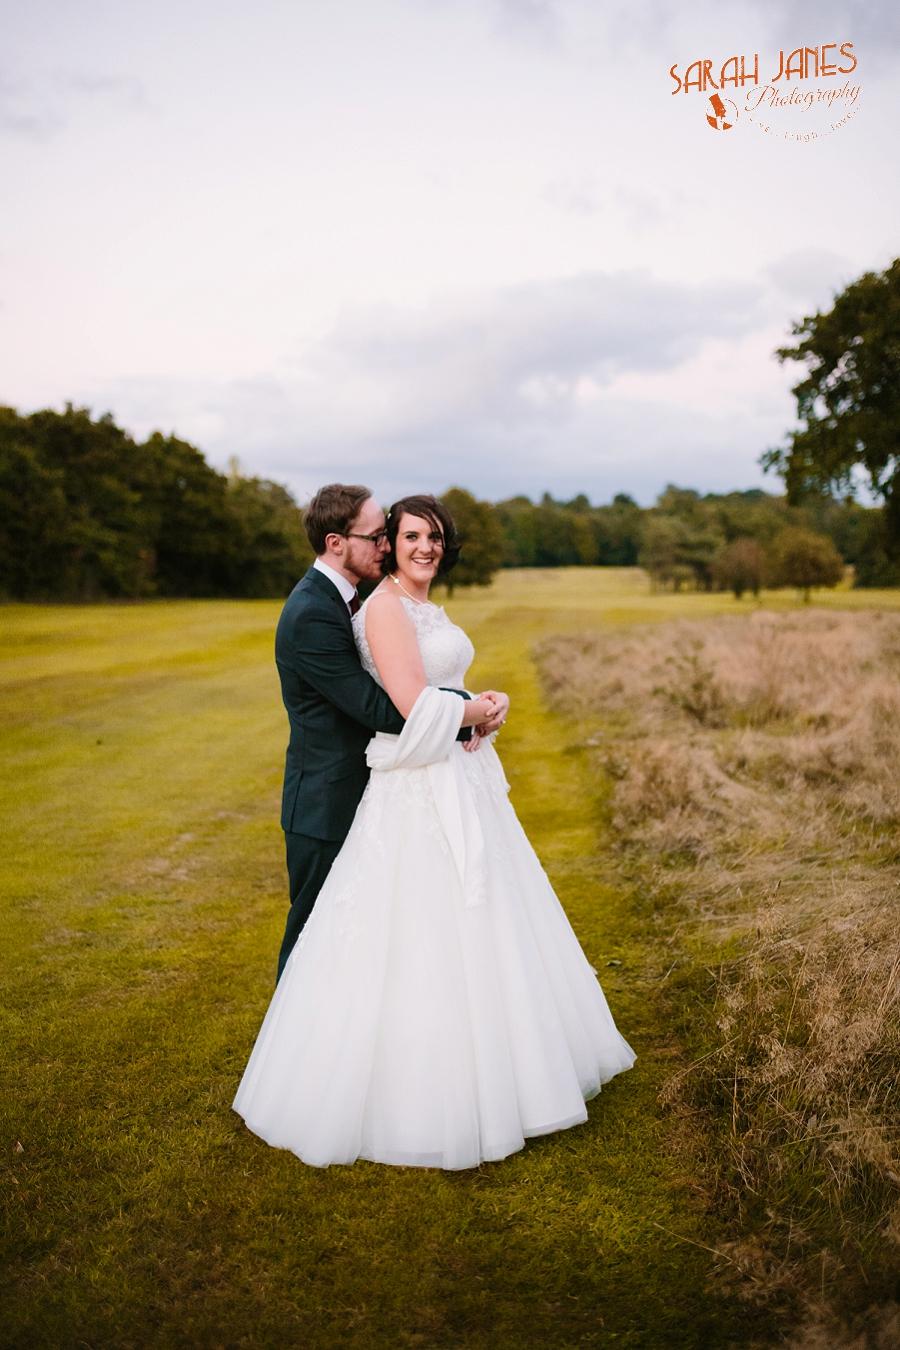 Sarah Janes Photography, Surrey wedding photography, wedding photography in Surrey, Wedding photography at Oaks Farm Weddings_0067.jpg